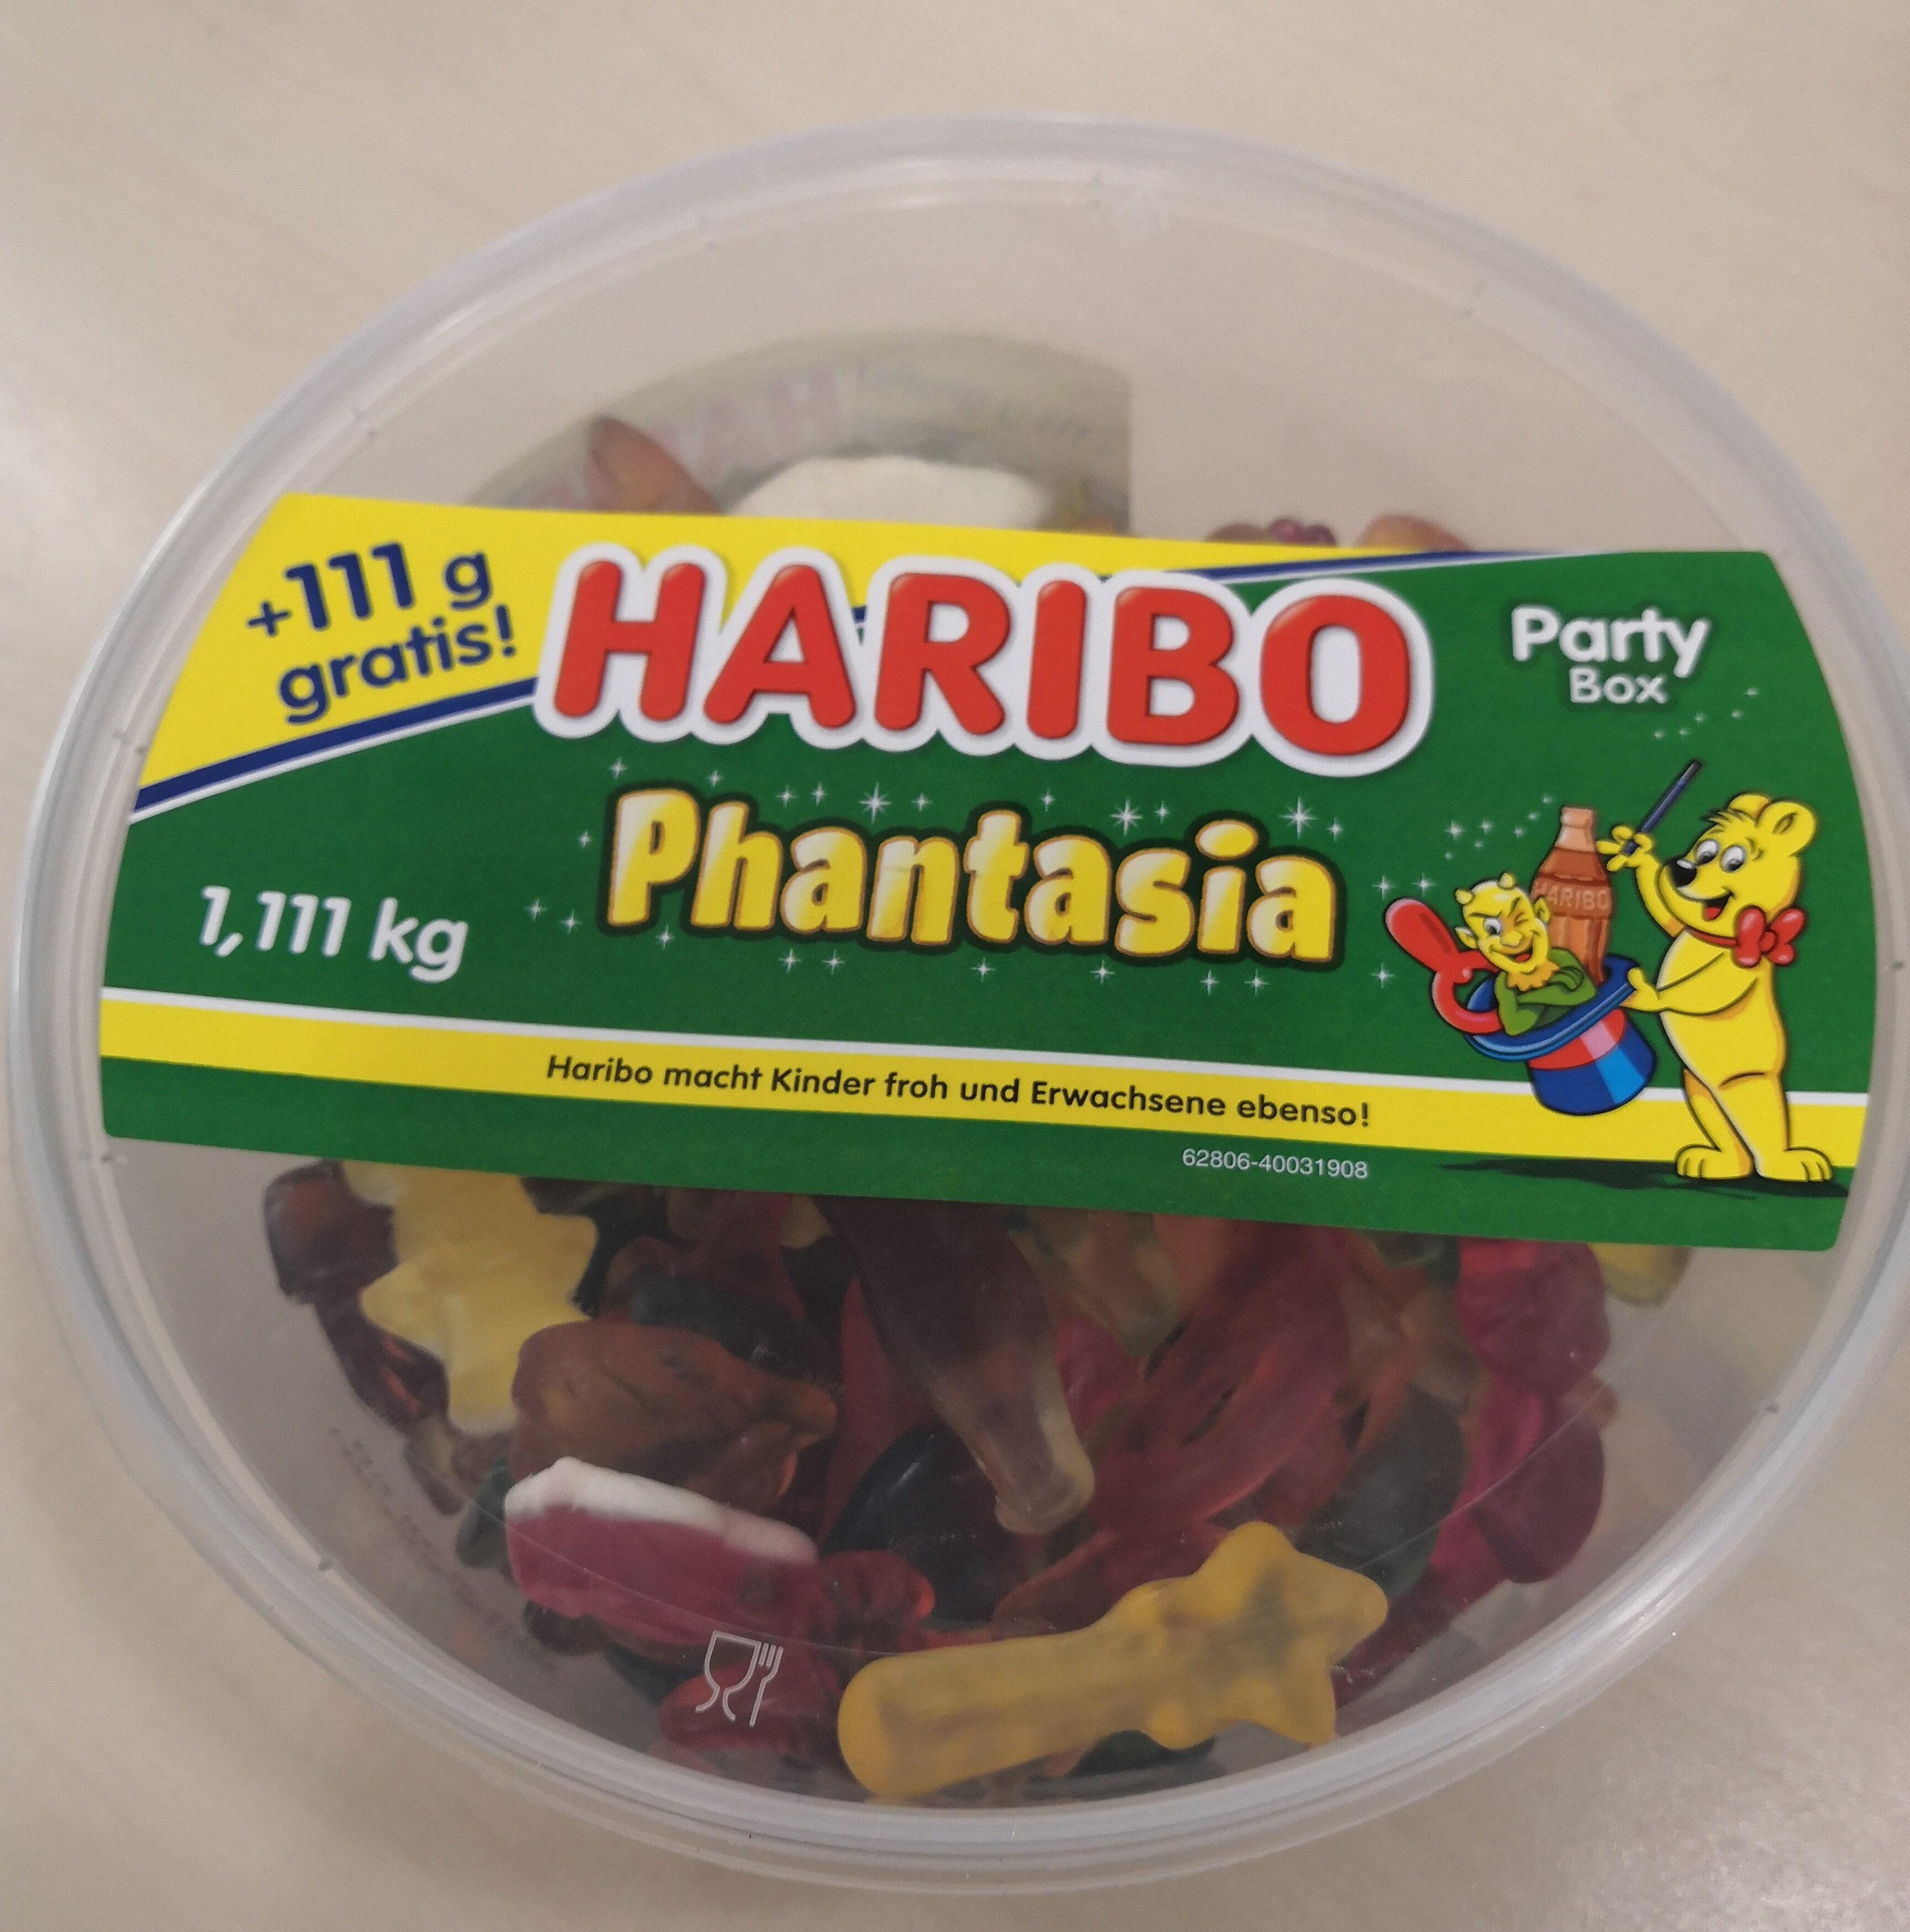 Phantasia - Product - de